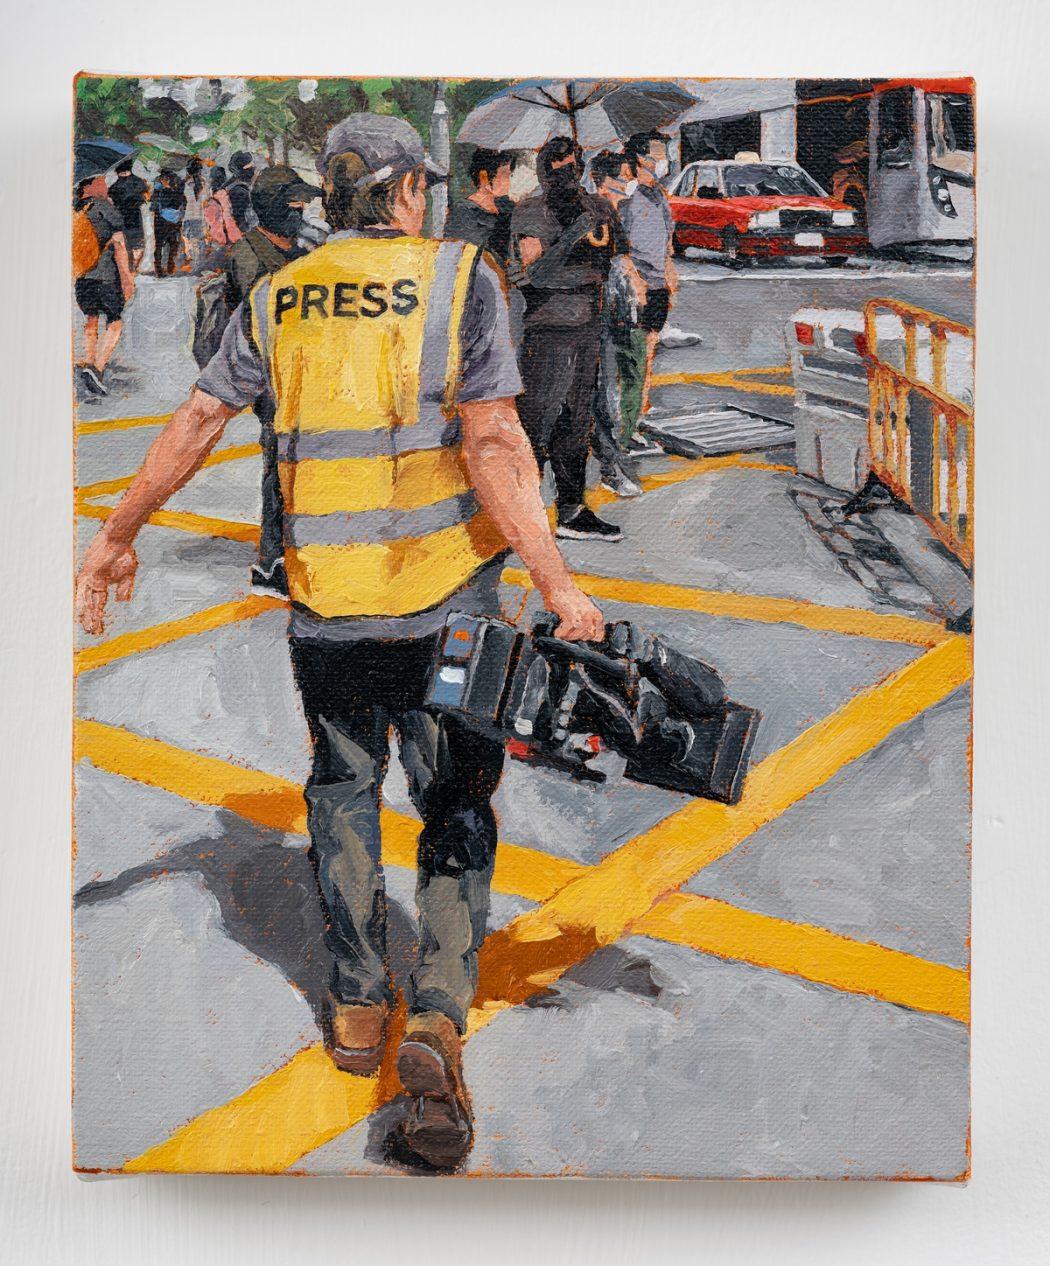 HKFP Lens Chow Chun-fai journalist protest